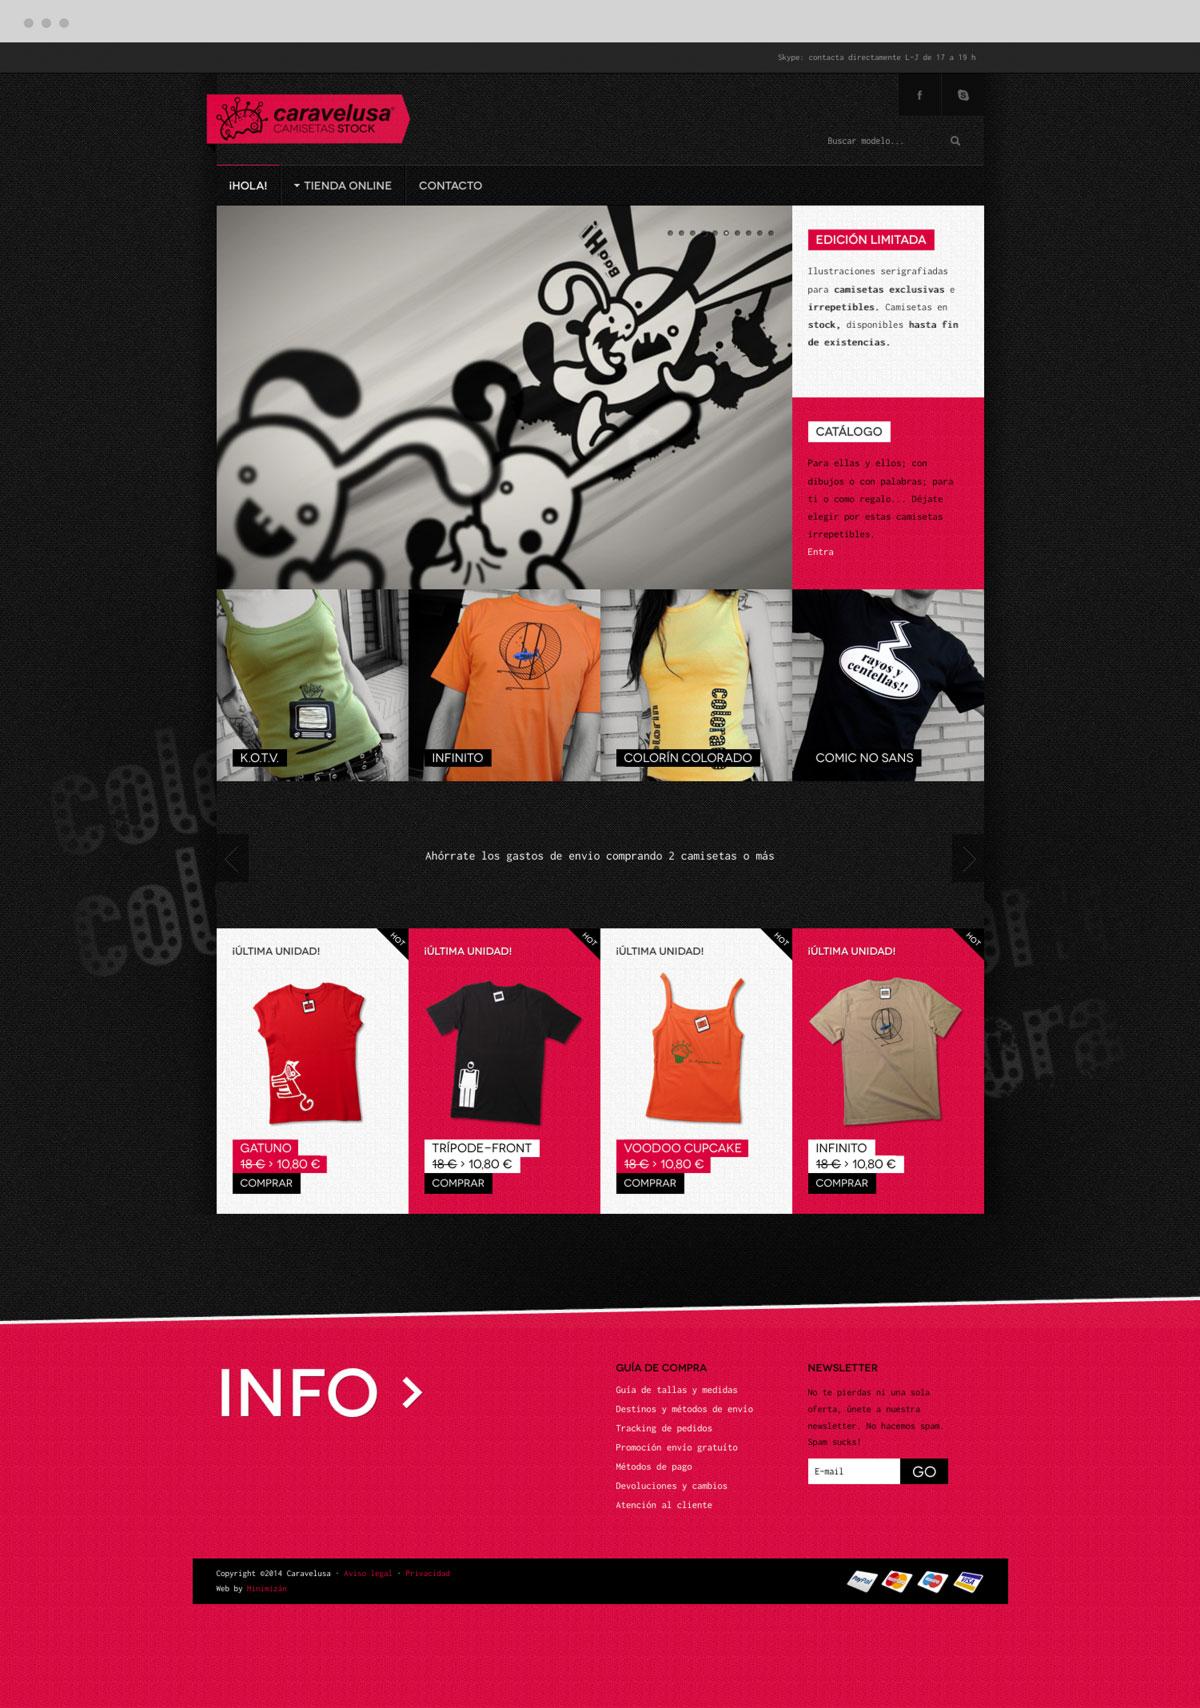 diseño página web sección Home para Caravelusa